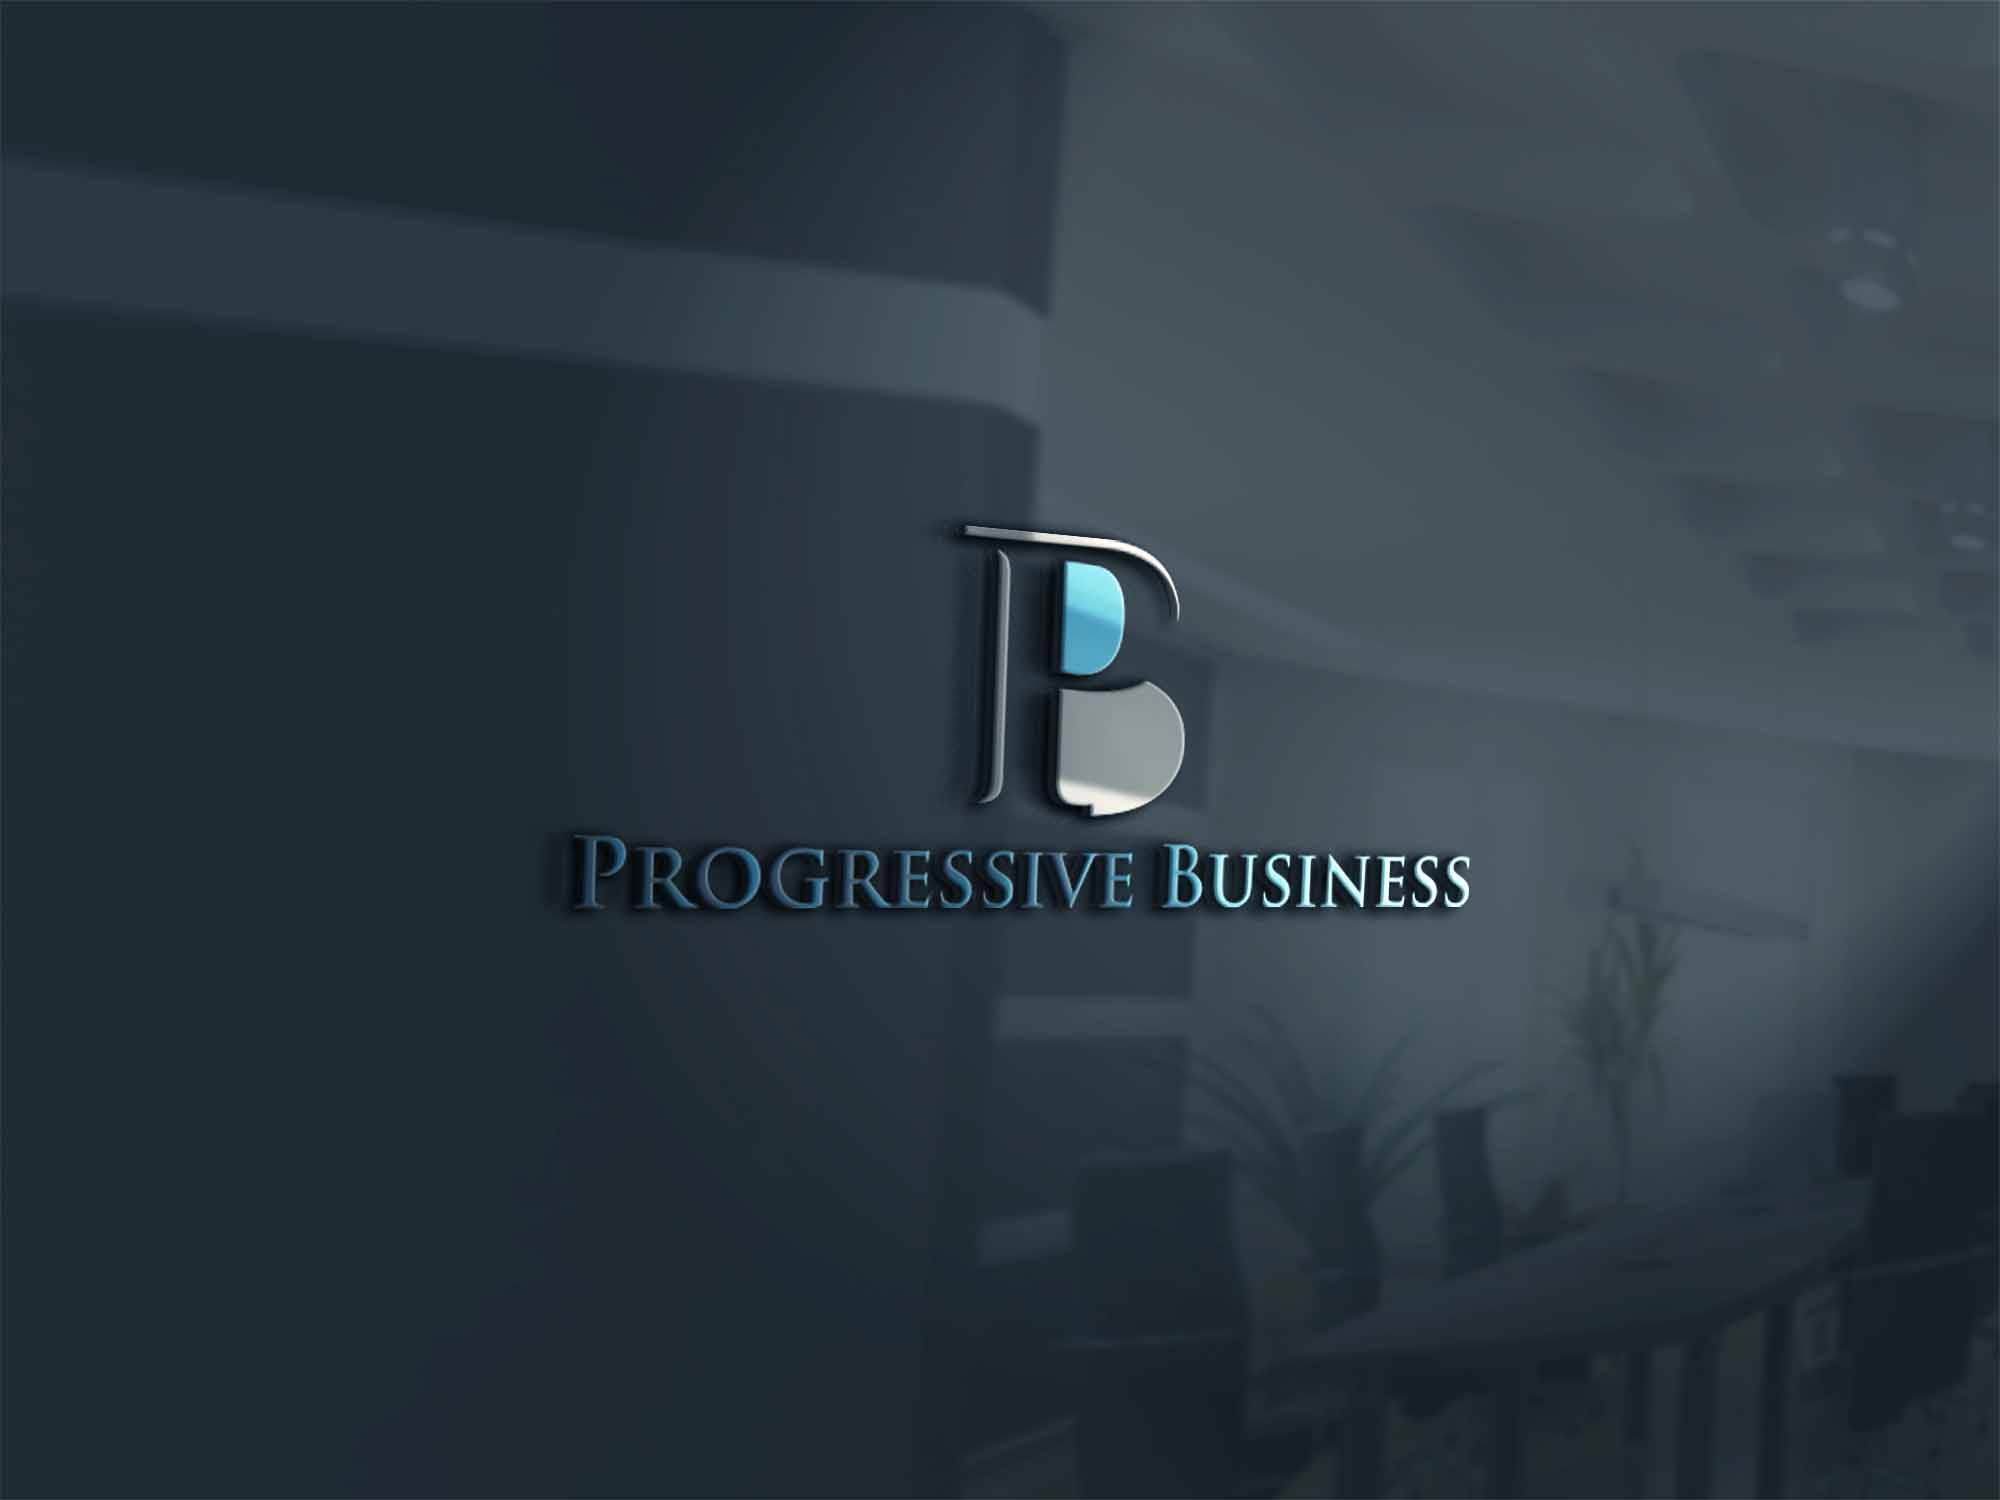 Logo Design by Private User - Entry No. 84 in the Logo Design Contest Captivating Logo Design for Progressive Business.